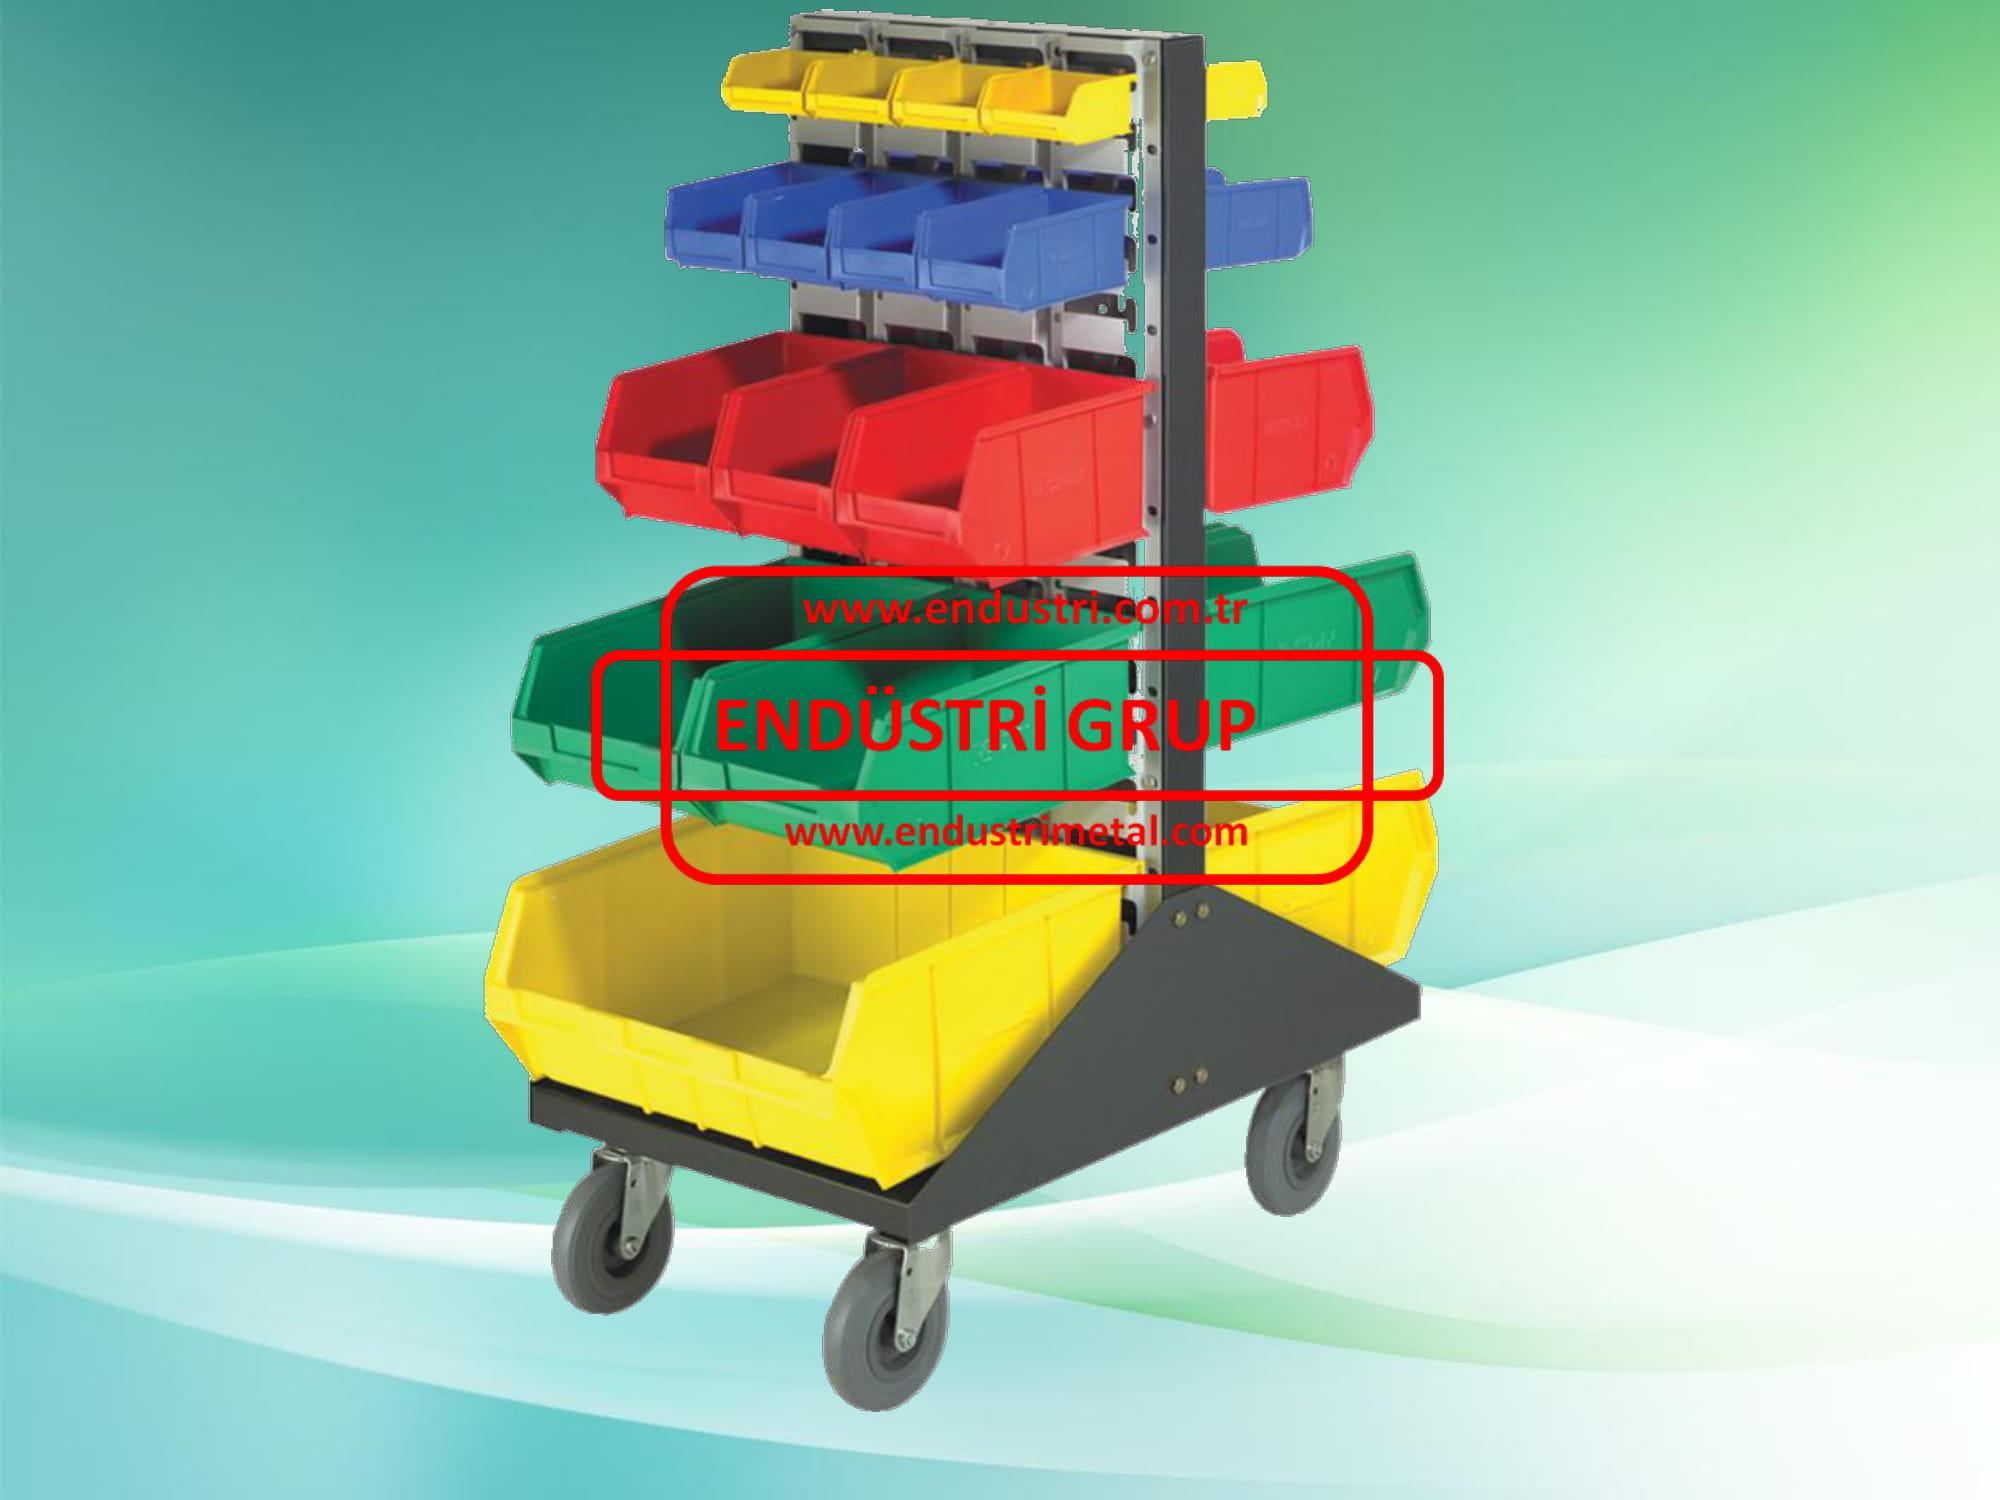 tekerlekli-paslanmaz-metal-rafli-kafesli-urun-saklama-bolme-avadanlik-tasima-yukleme-dizme-arabasi-arabalari-kasasi-fiyati